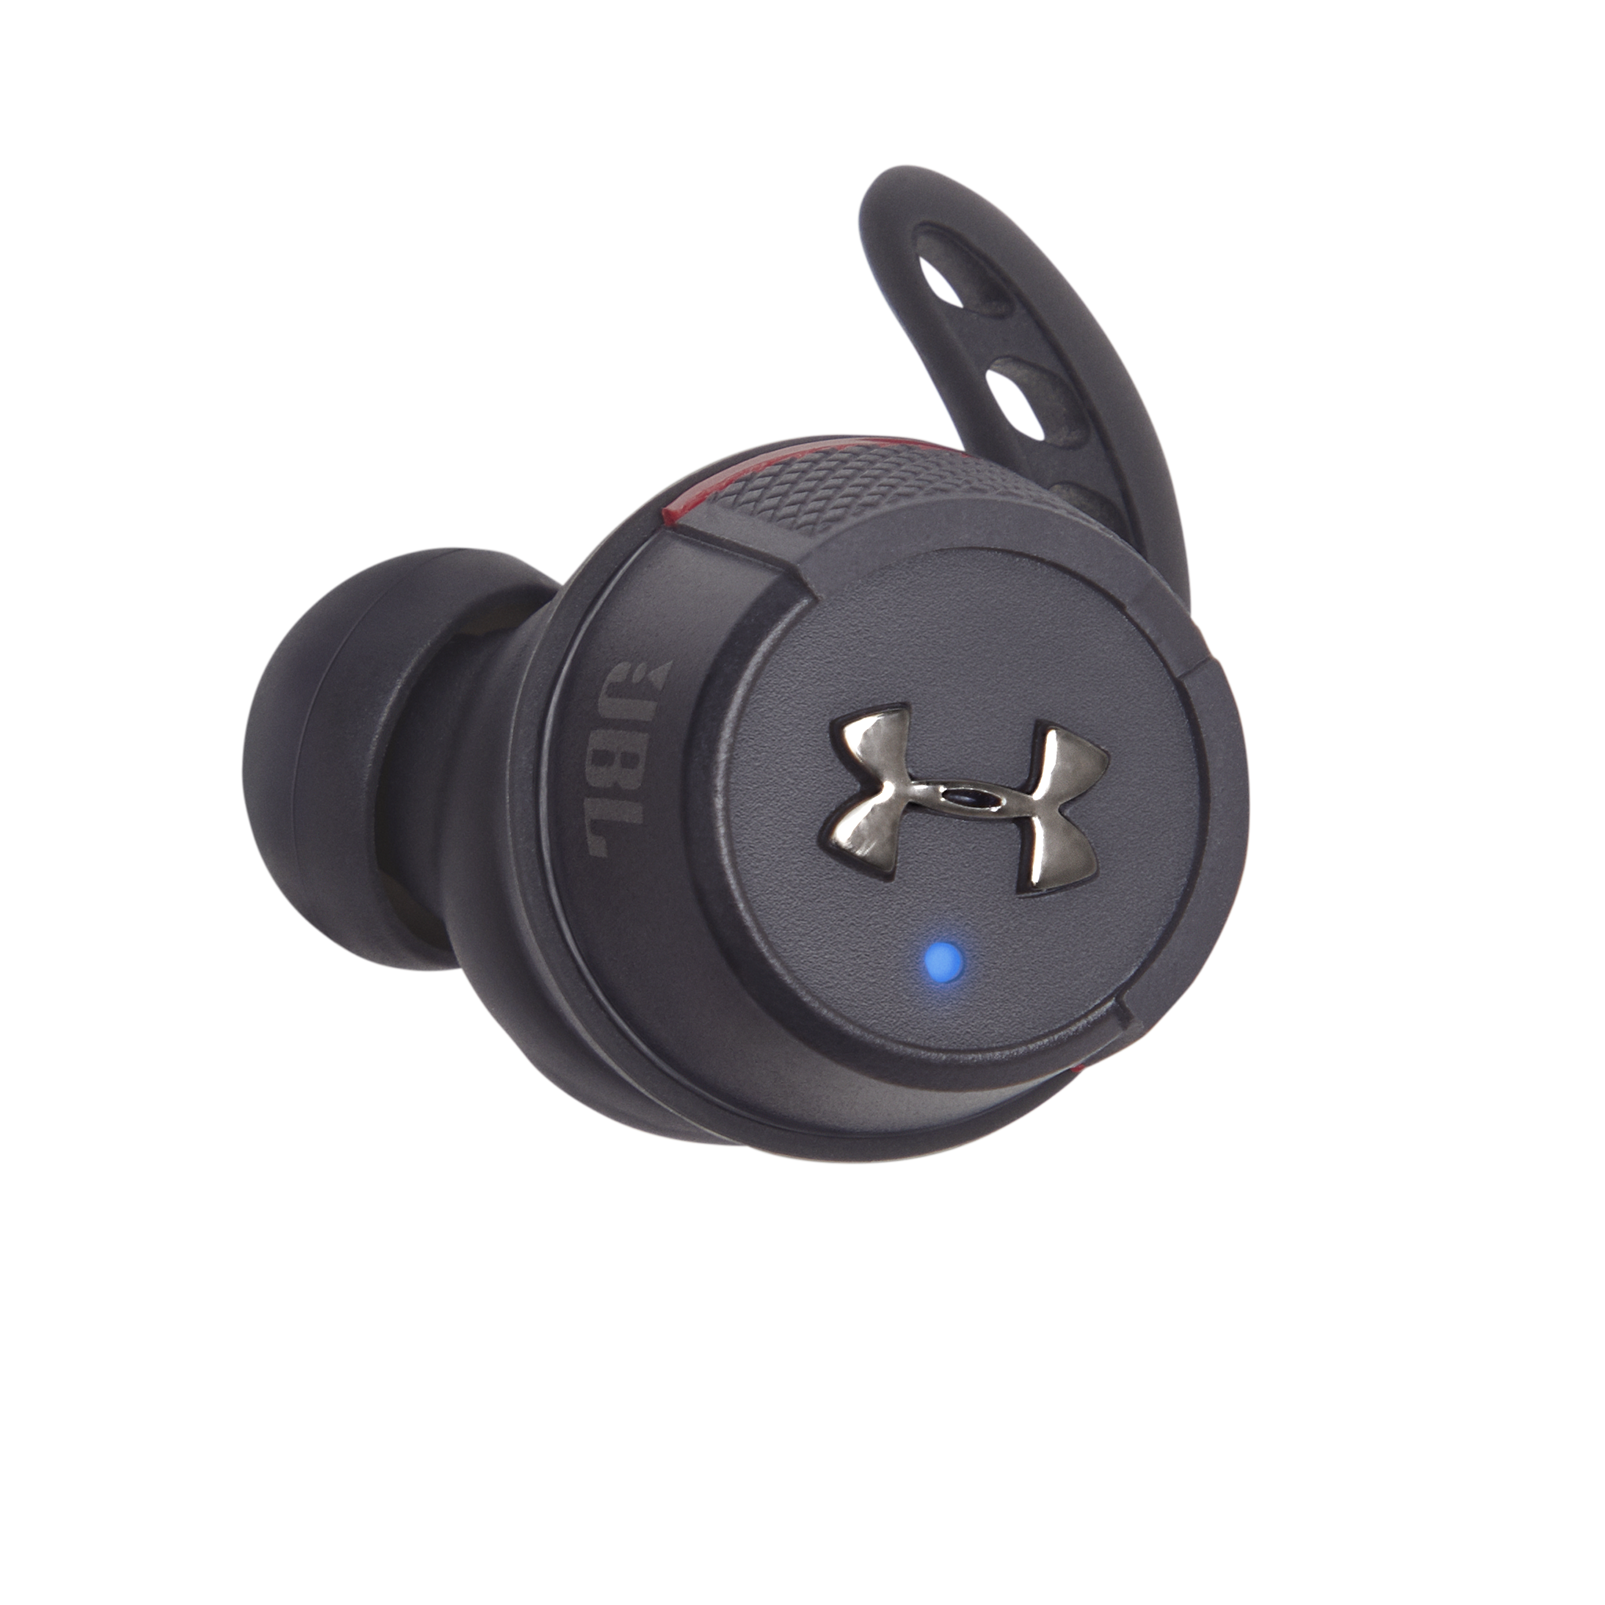 JBL FLASH EAR PIECE (LEFT)